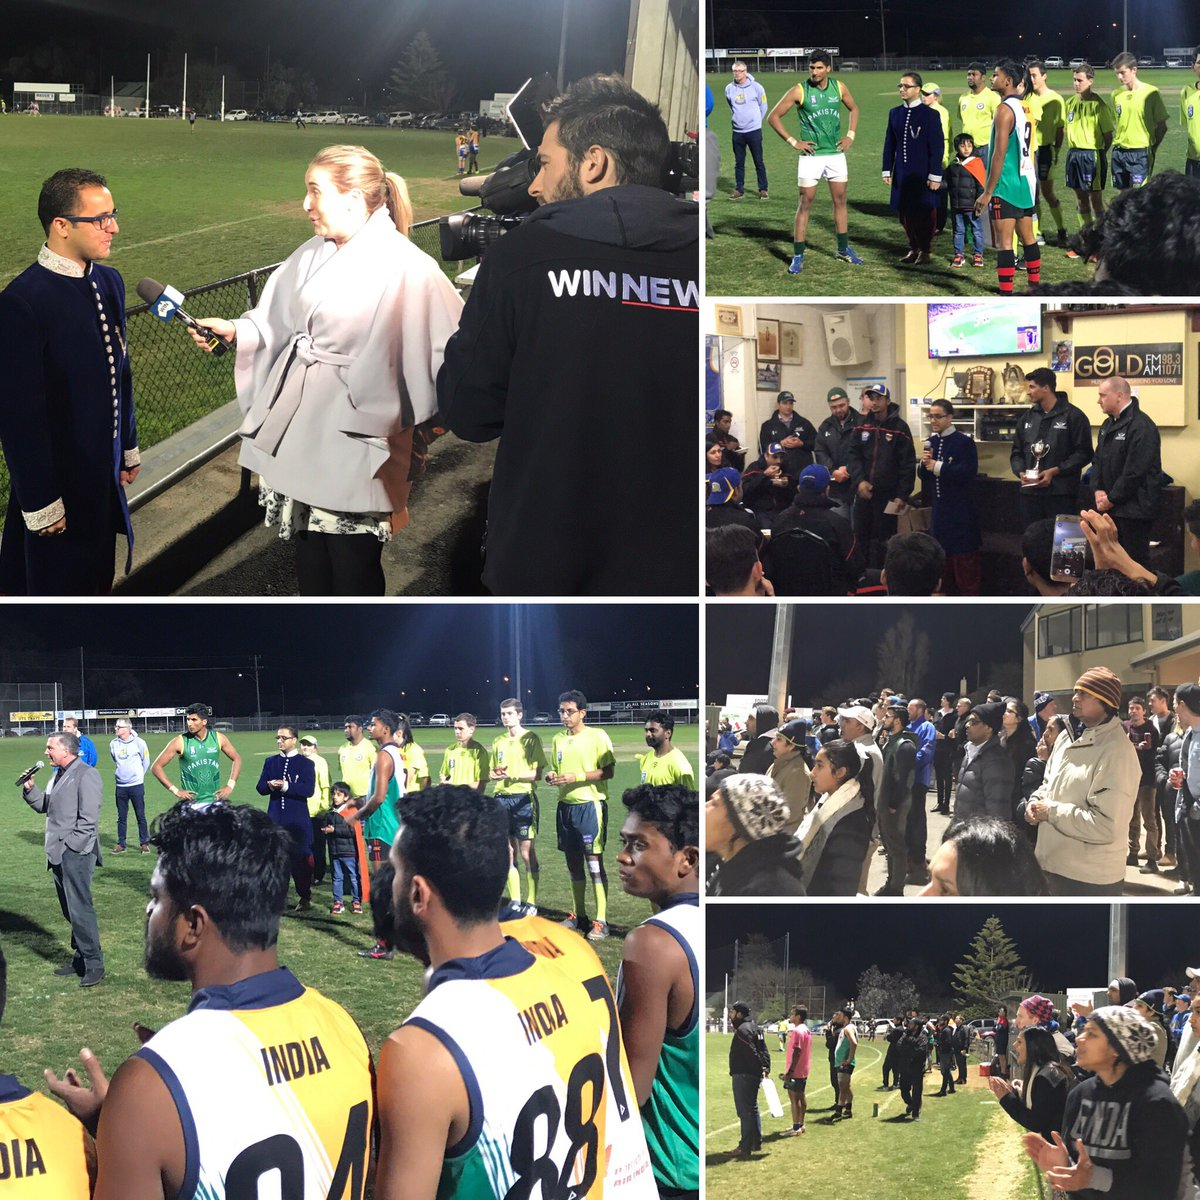 Wonderful game of @AFL @AFLIntCup at Wade St Oval in @GreaterBendigo #INDvPAK @AFLIndia @afldiversity @aflvic - #ThankYou GSNFC committee<br>http://pic.twitter.com/n0Jqhudynm